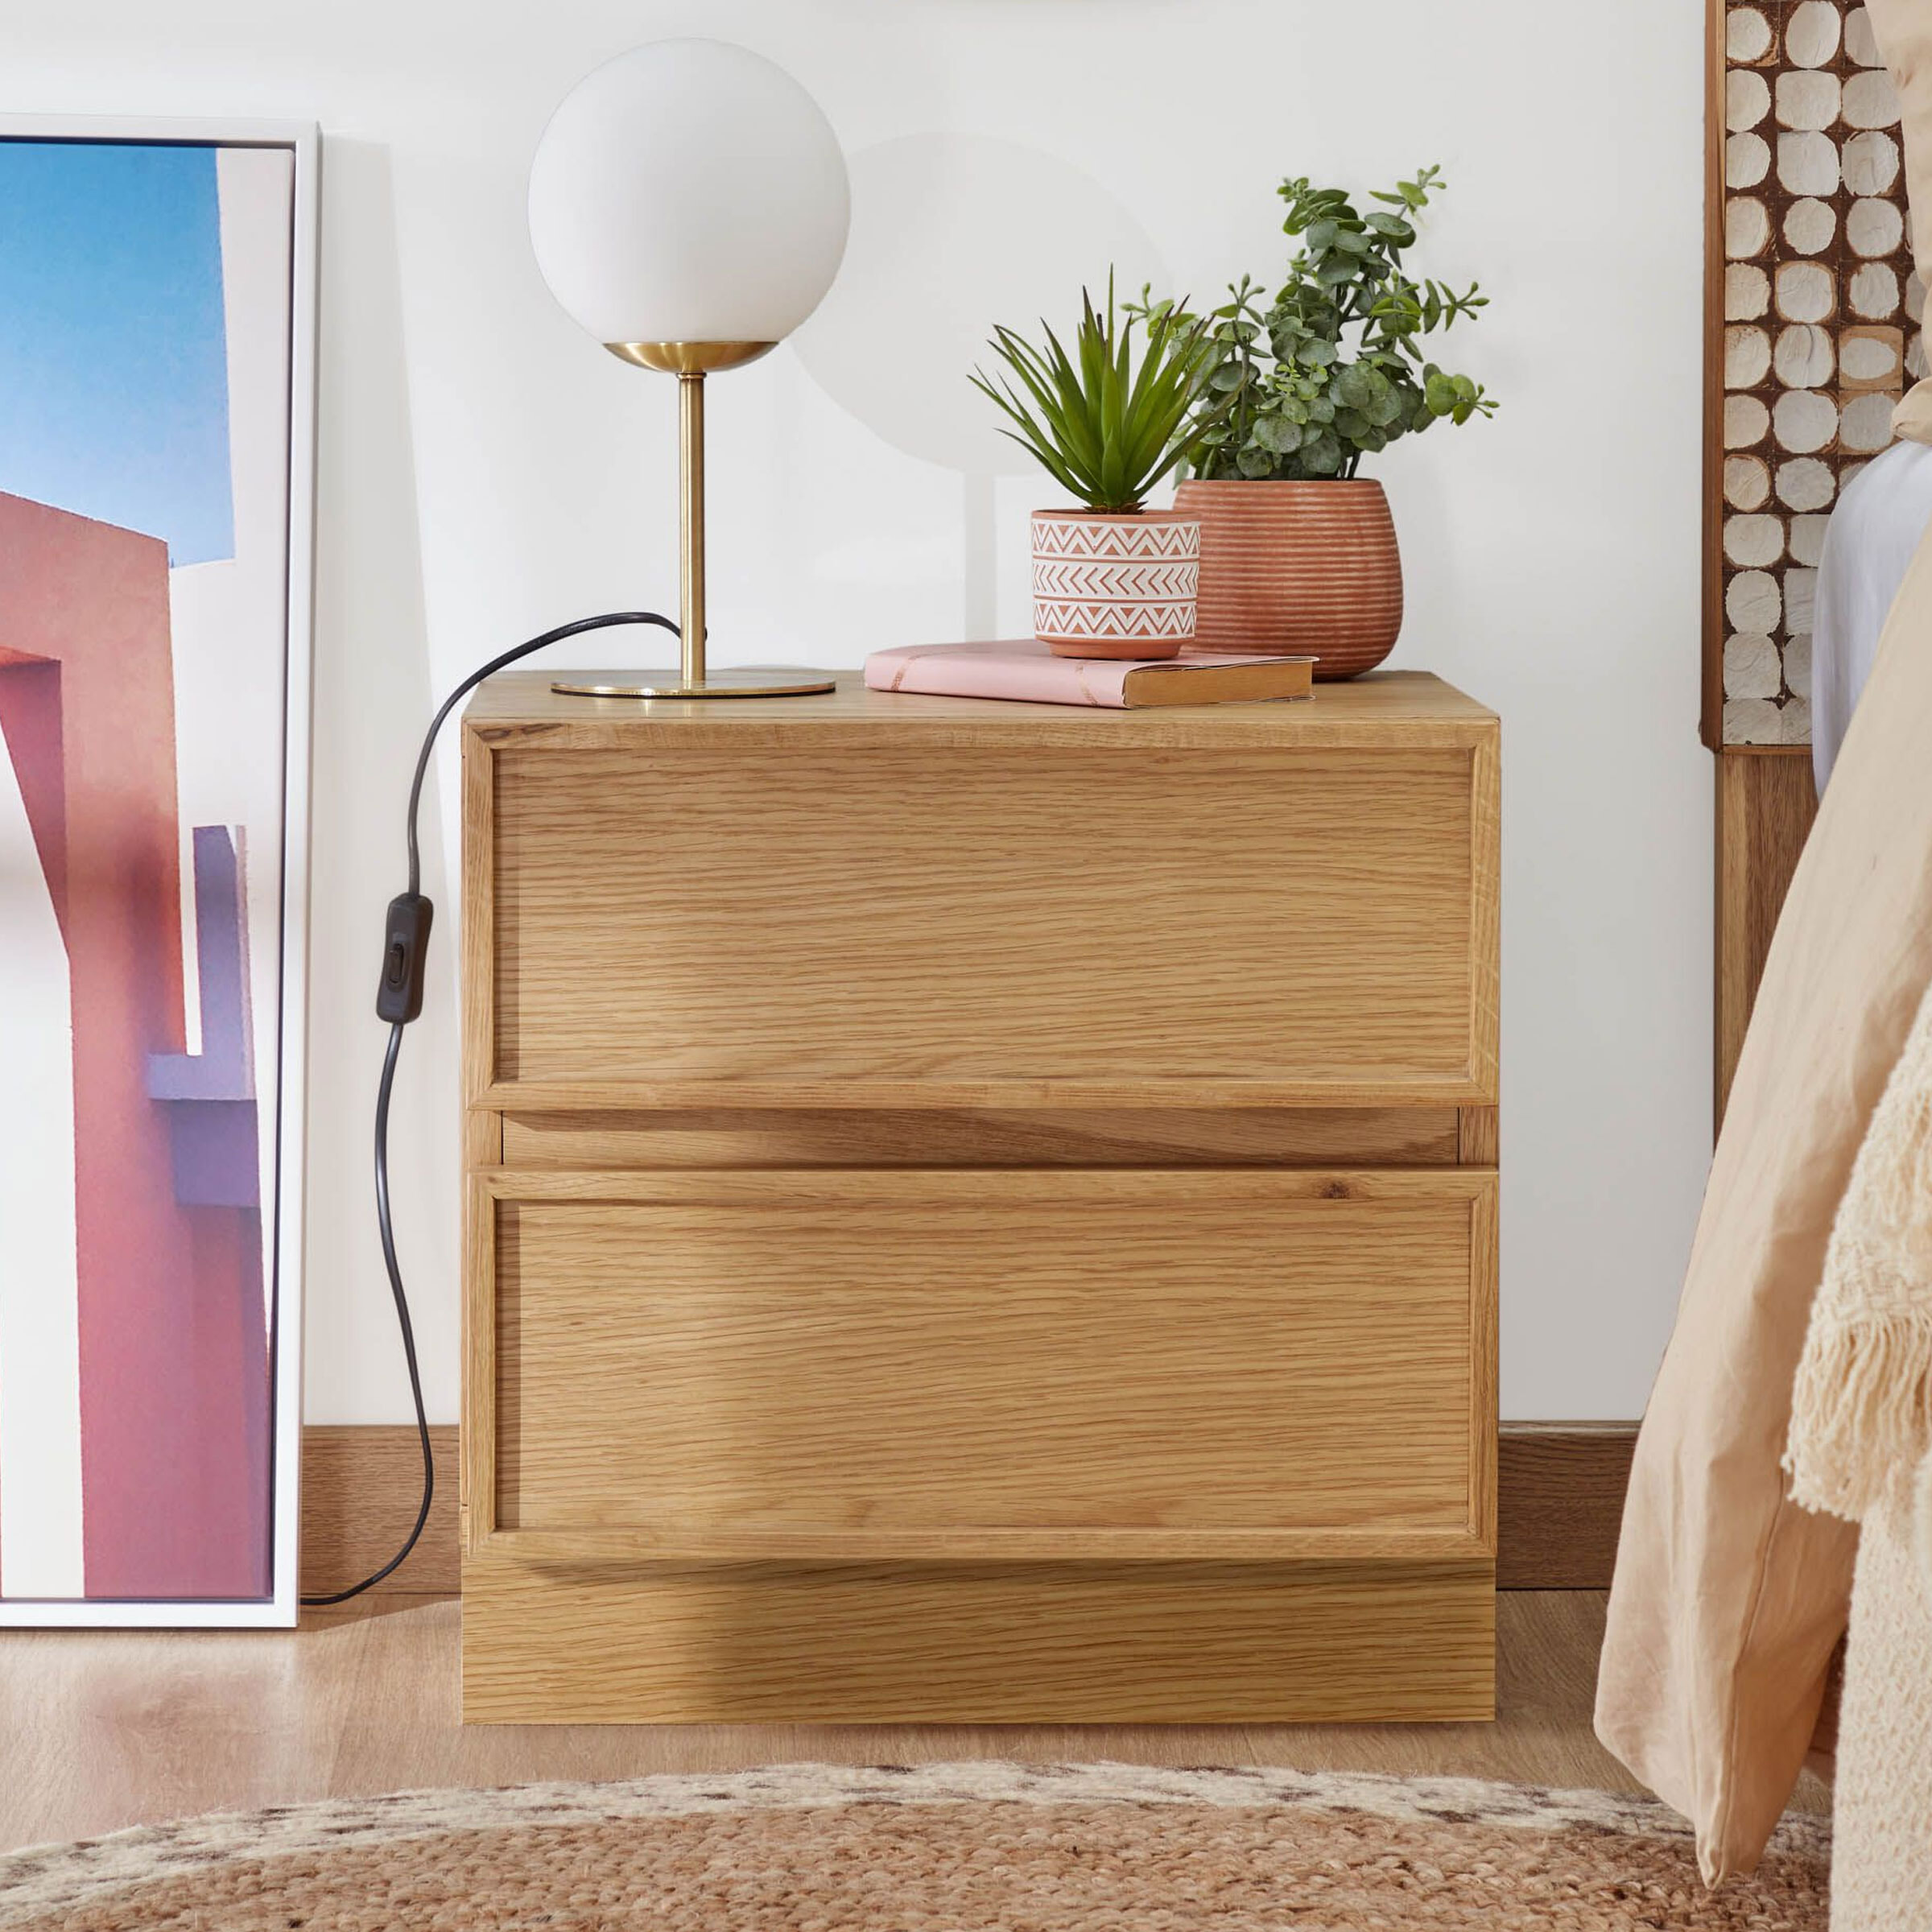 Kave Home Nachtkastje 'Taiana' Eiken, 44 x 45cm